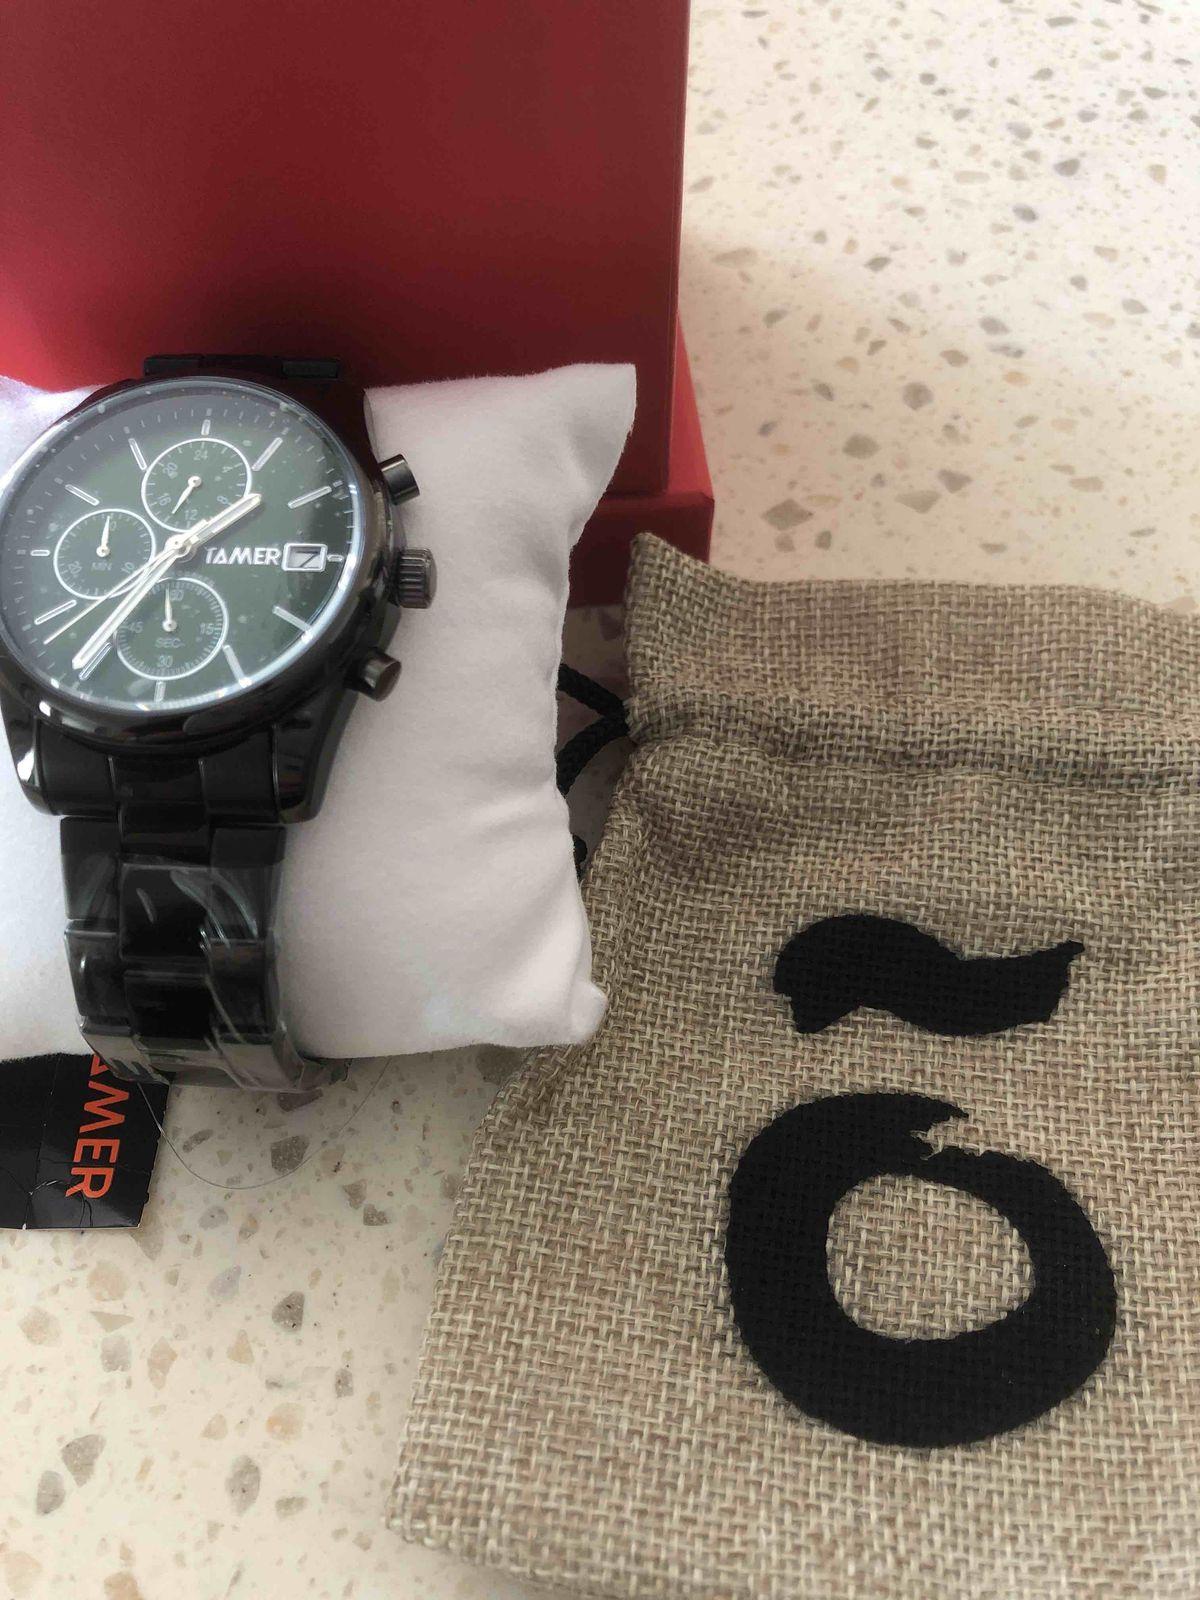 Мужские часы TAMER